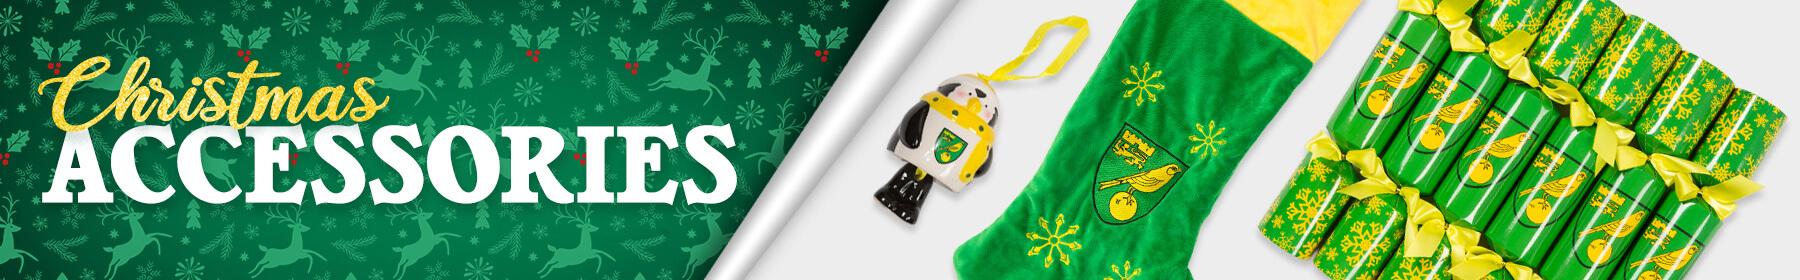 Christmas Accessories - Shop Now!